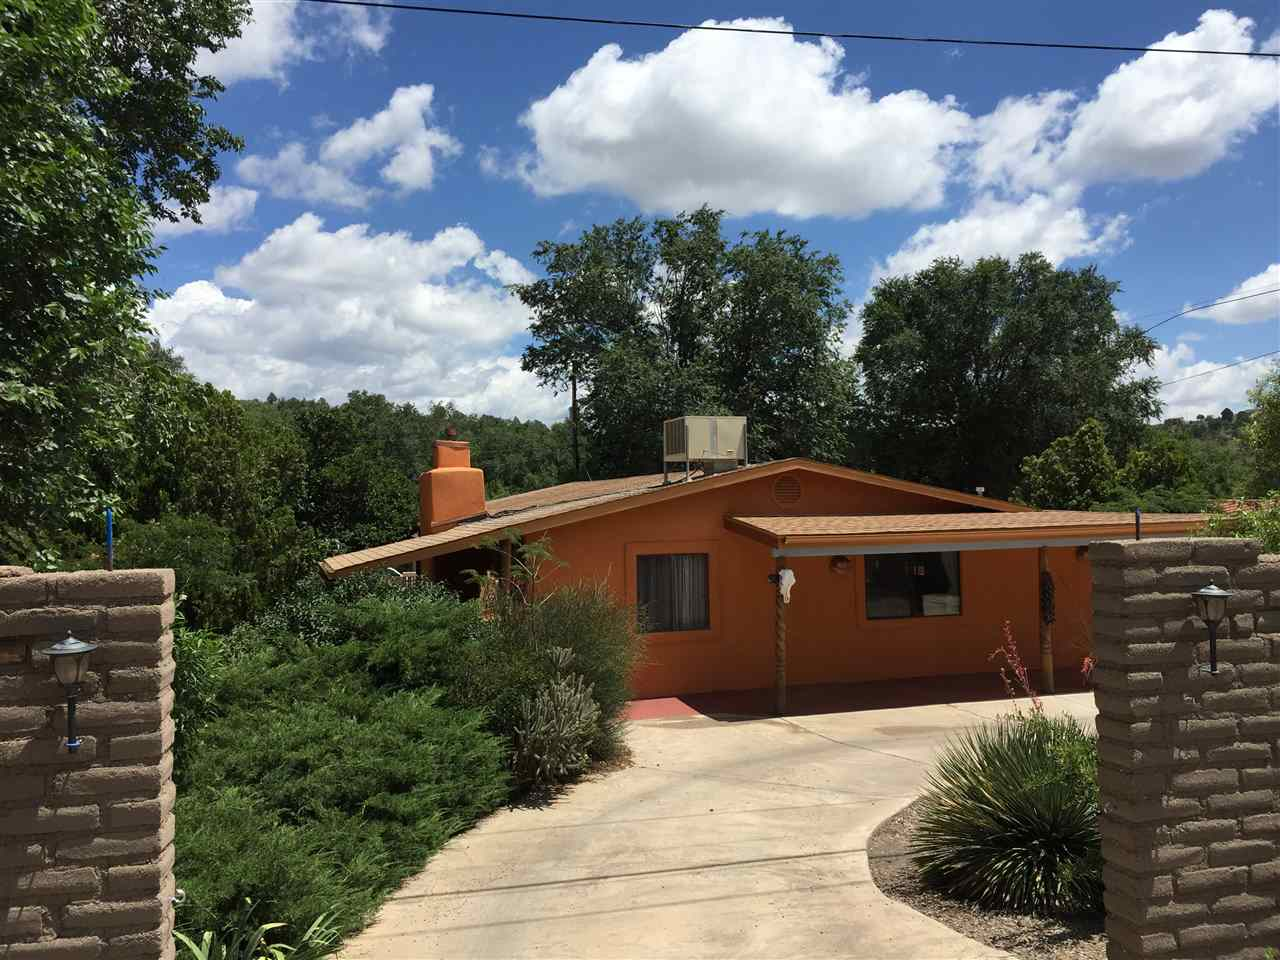 MLS# 33962 - 2072  Cottage San Rd. Silver City NM 88061